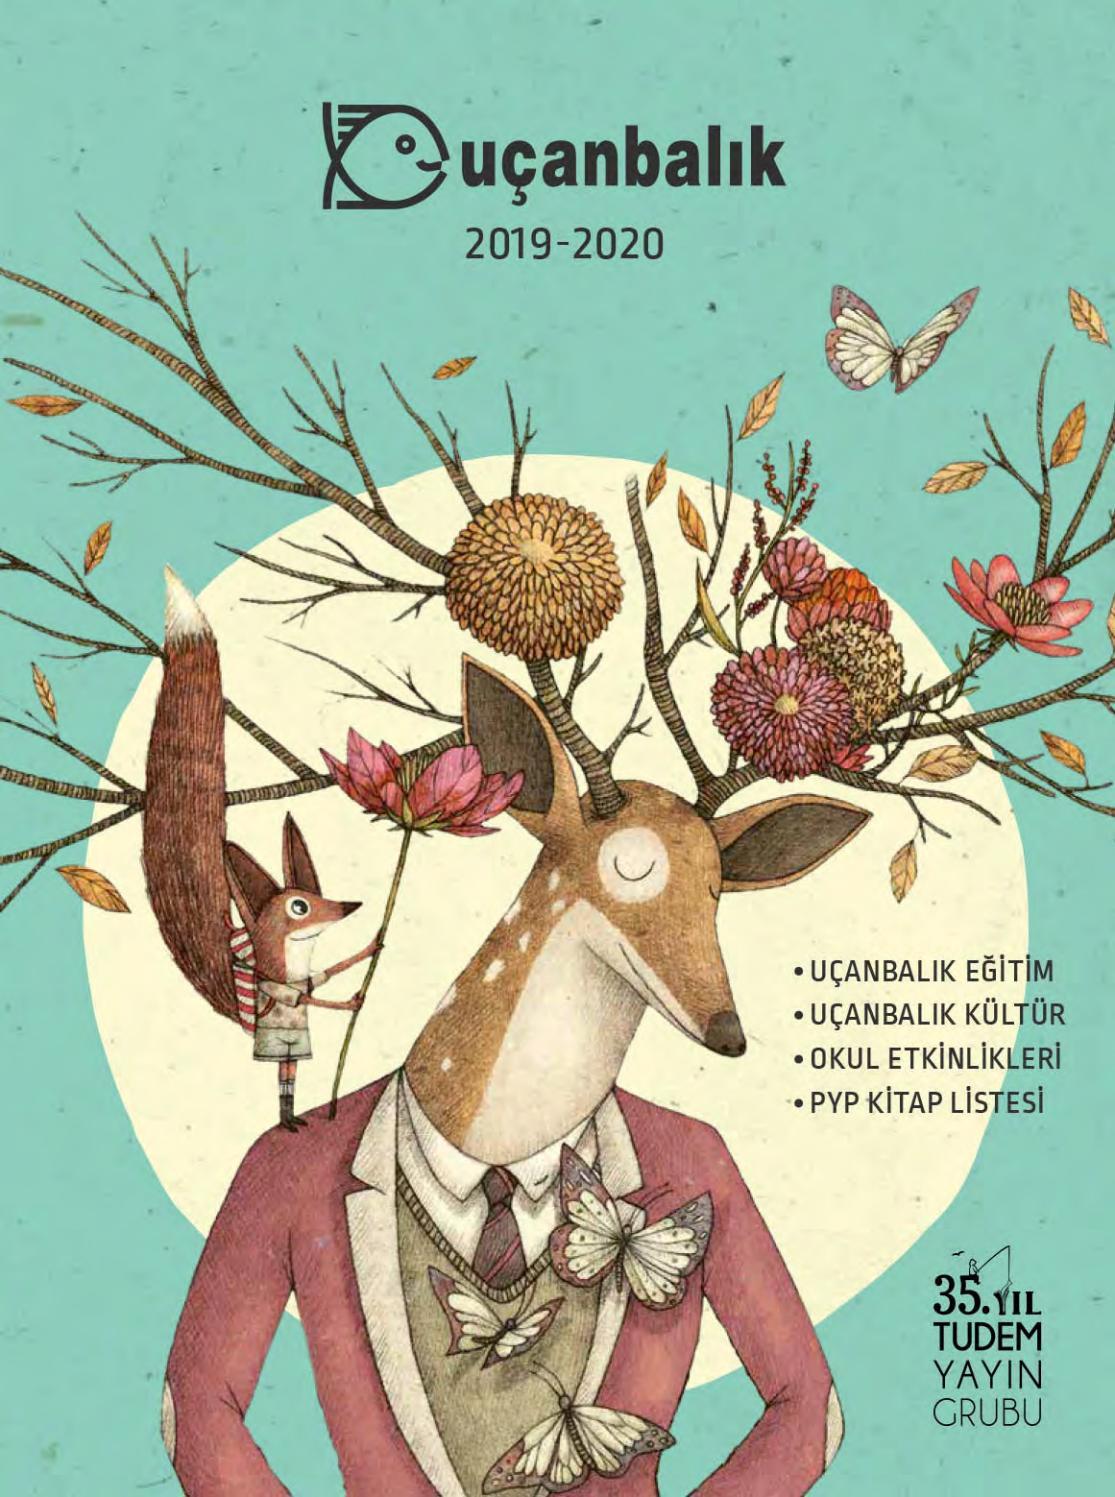 Uçanbaalık Yayın Kataloğu 2019 - 2020 By Tudem - Issuu destiné Jeux De Fille Gratuit D Animaux